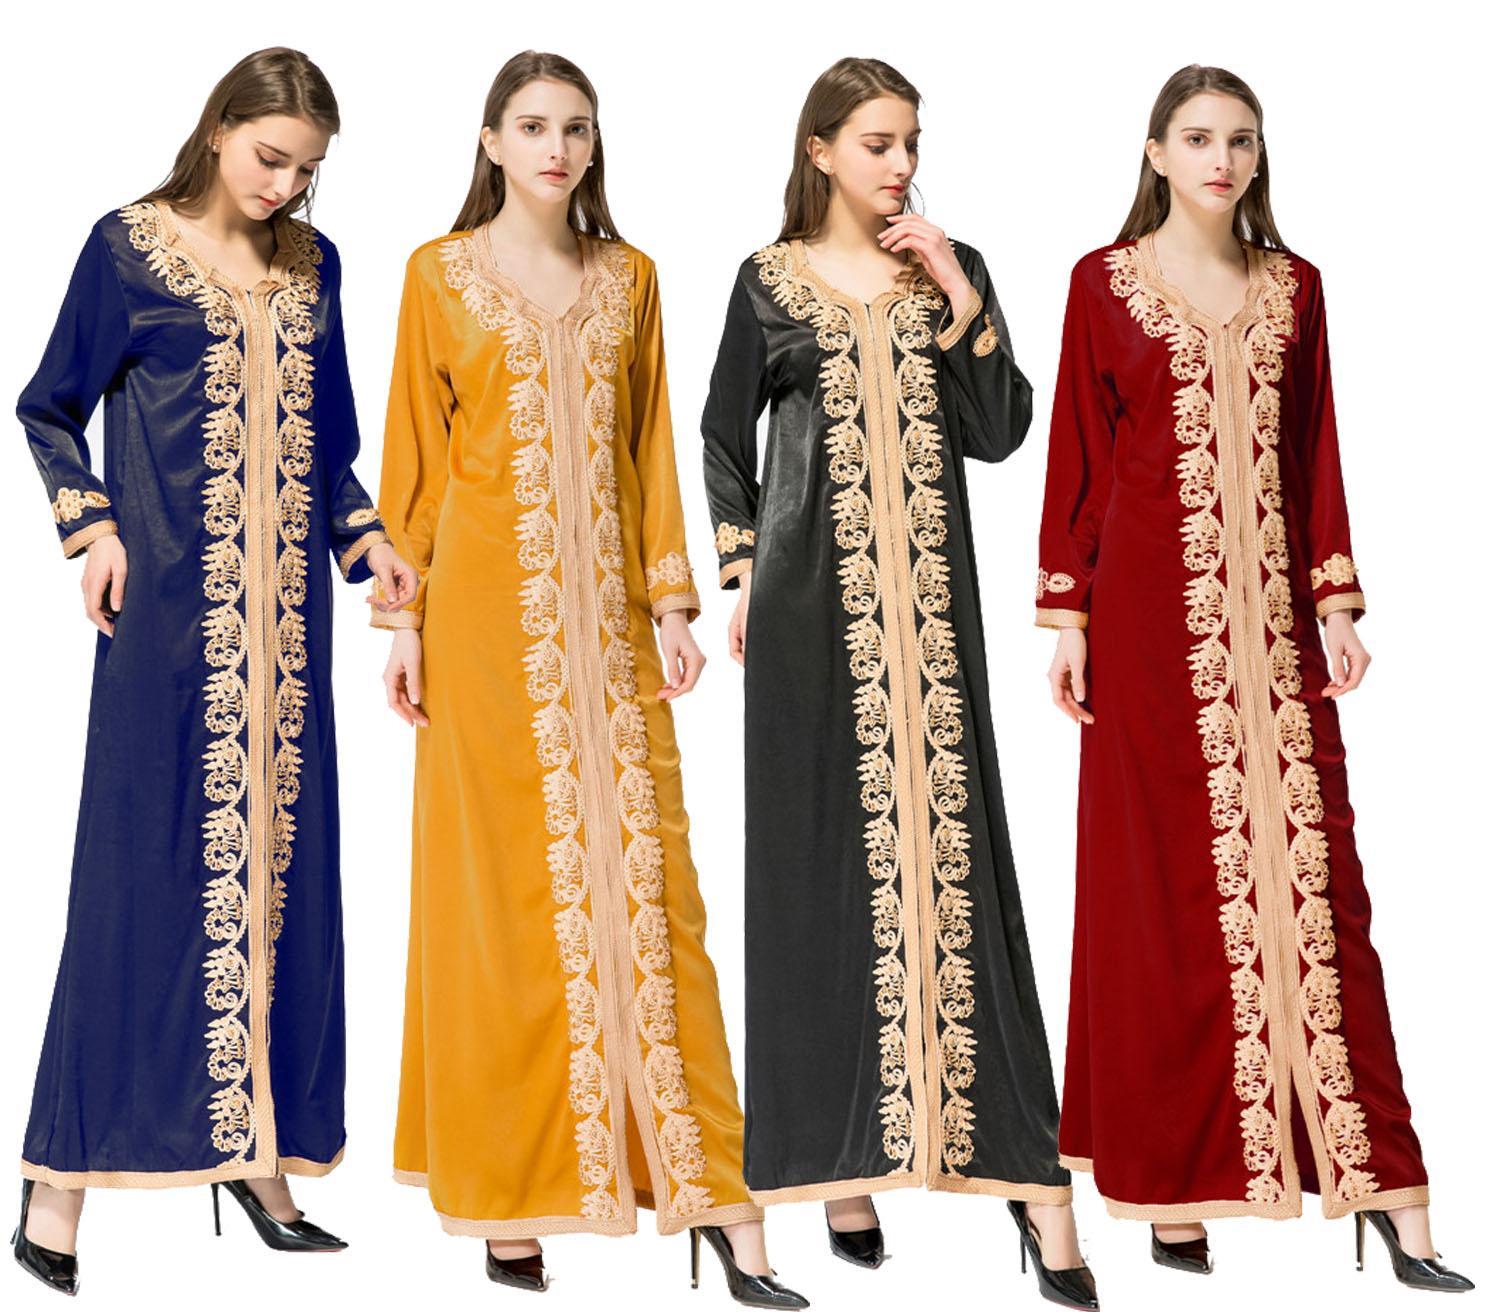 Women Muslim Dubai Kaftan Arabic Long Dress Abaya Islamic Clothing Caftan Gown Velvet Maxi Cocktail Robe Jilbab Moroccan Middle East